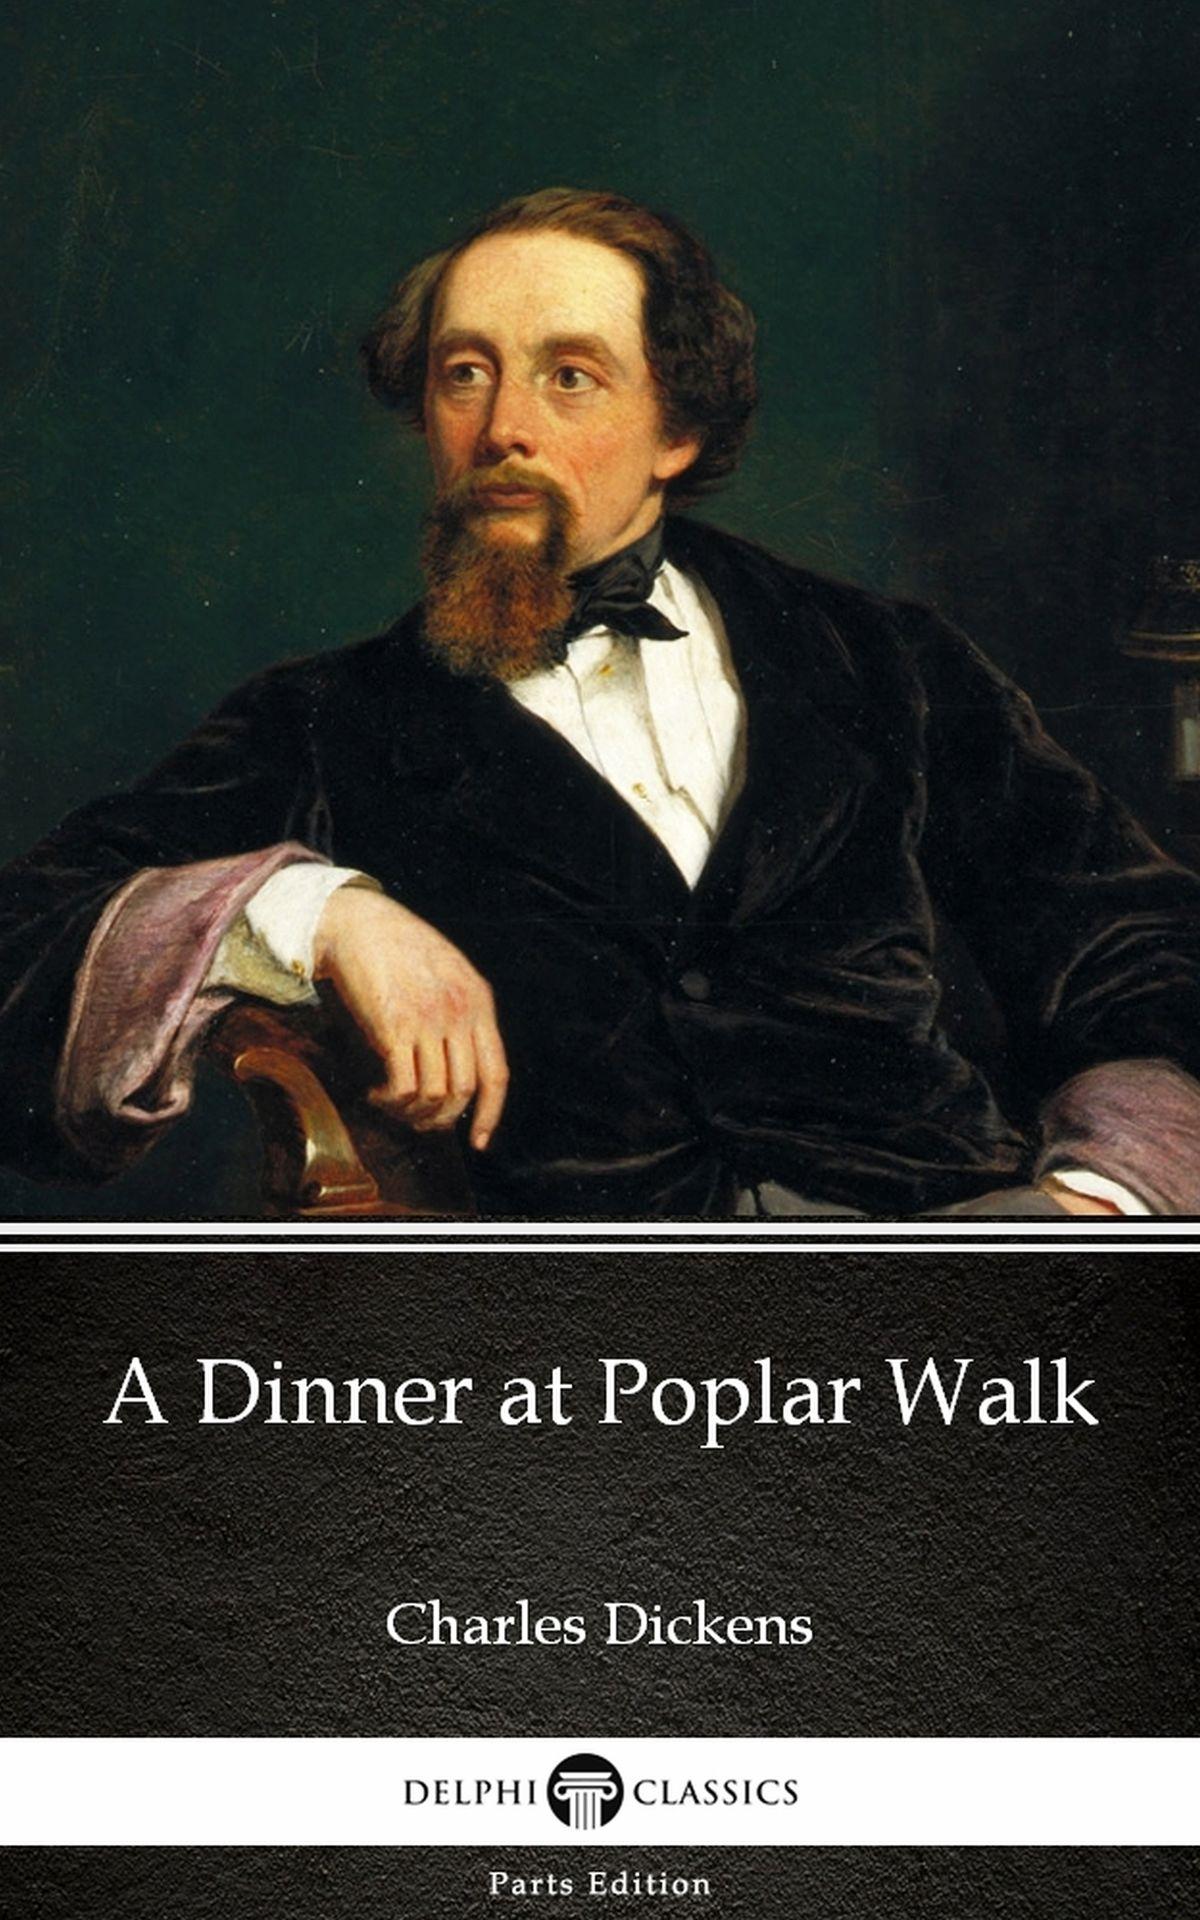 The Full List Of Charles Dickens Books